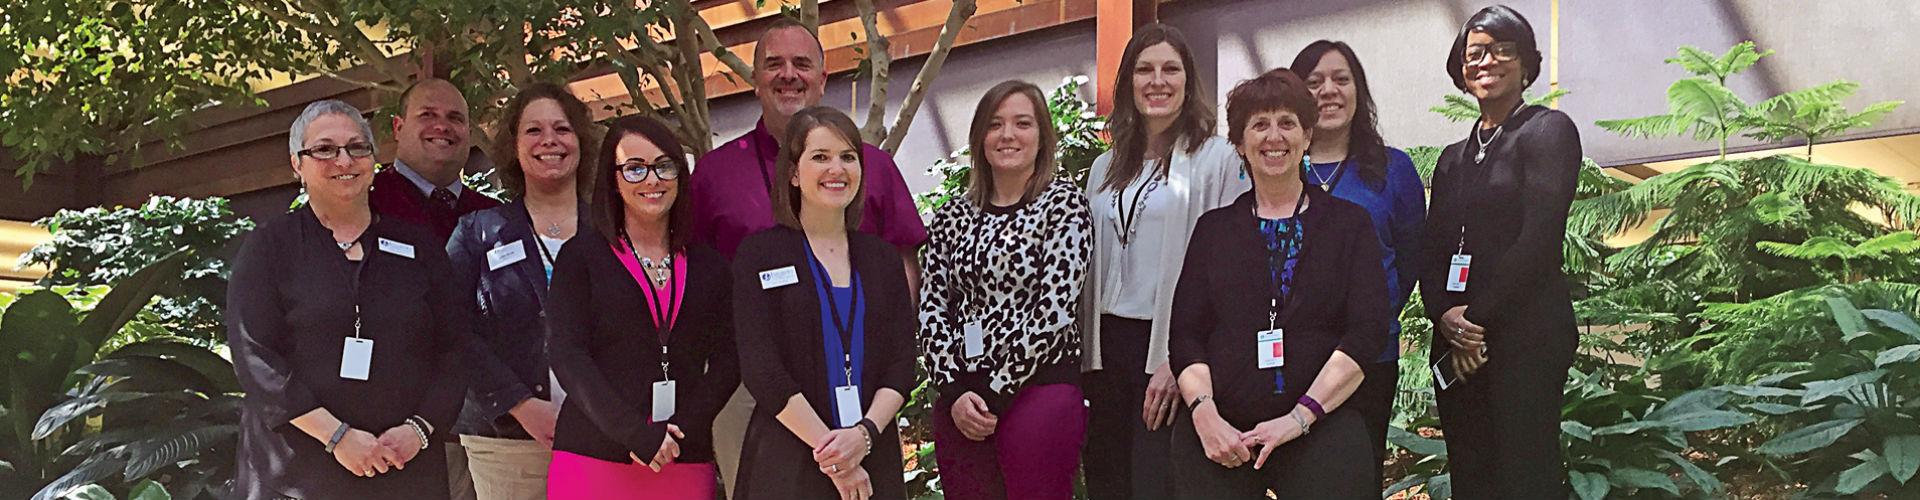 Integrity Integrated Davenport Cedar Rapids Programs header